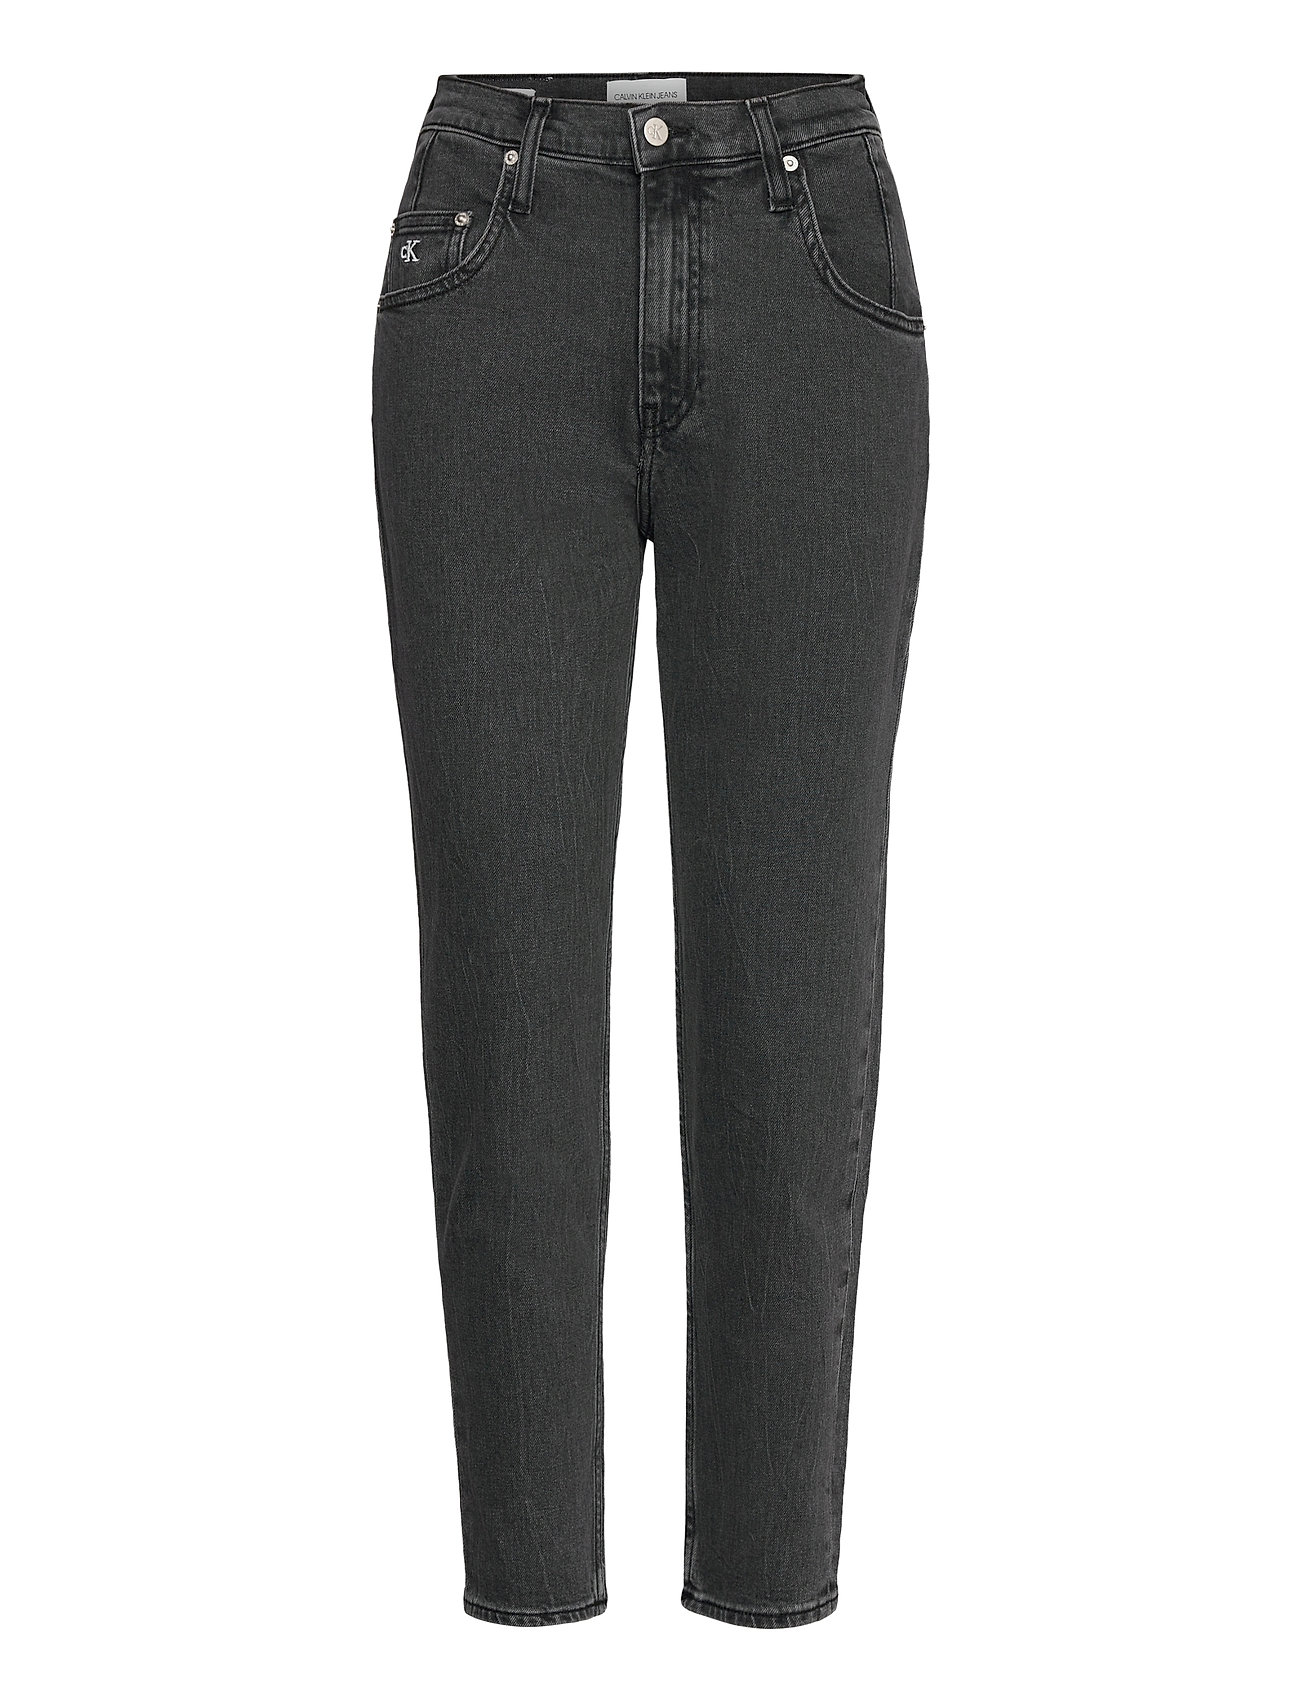 Image of Mom Jean Jeans Mom Jeans Sort Calvin Klein Jeans (3475359697)